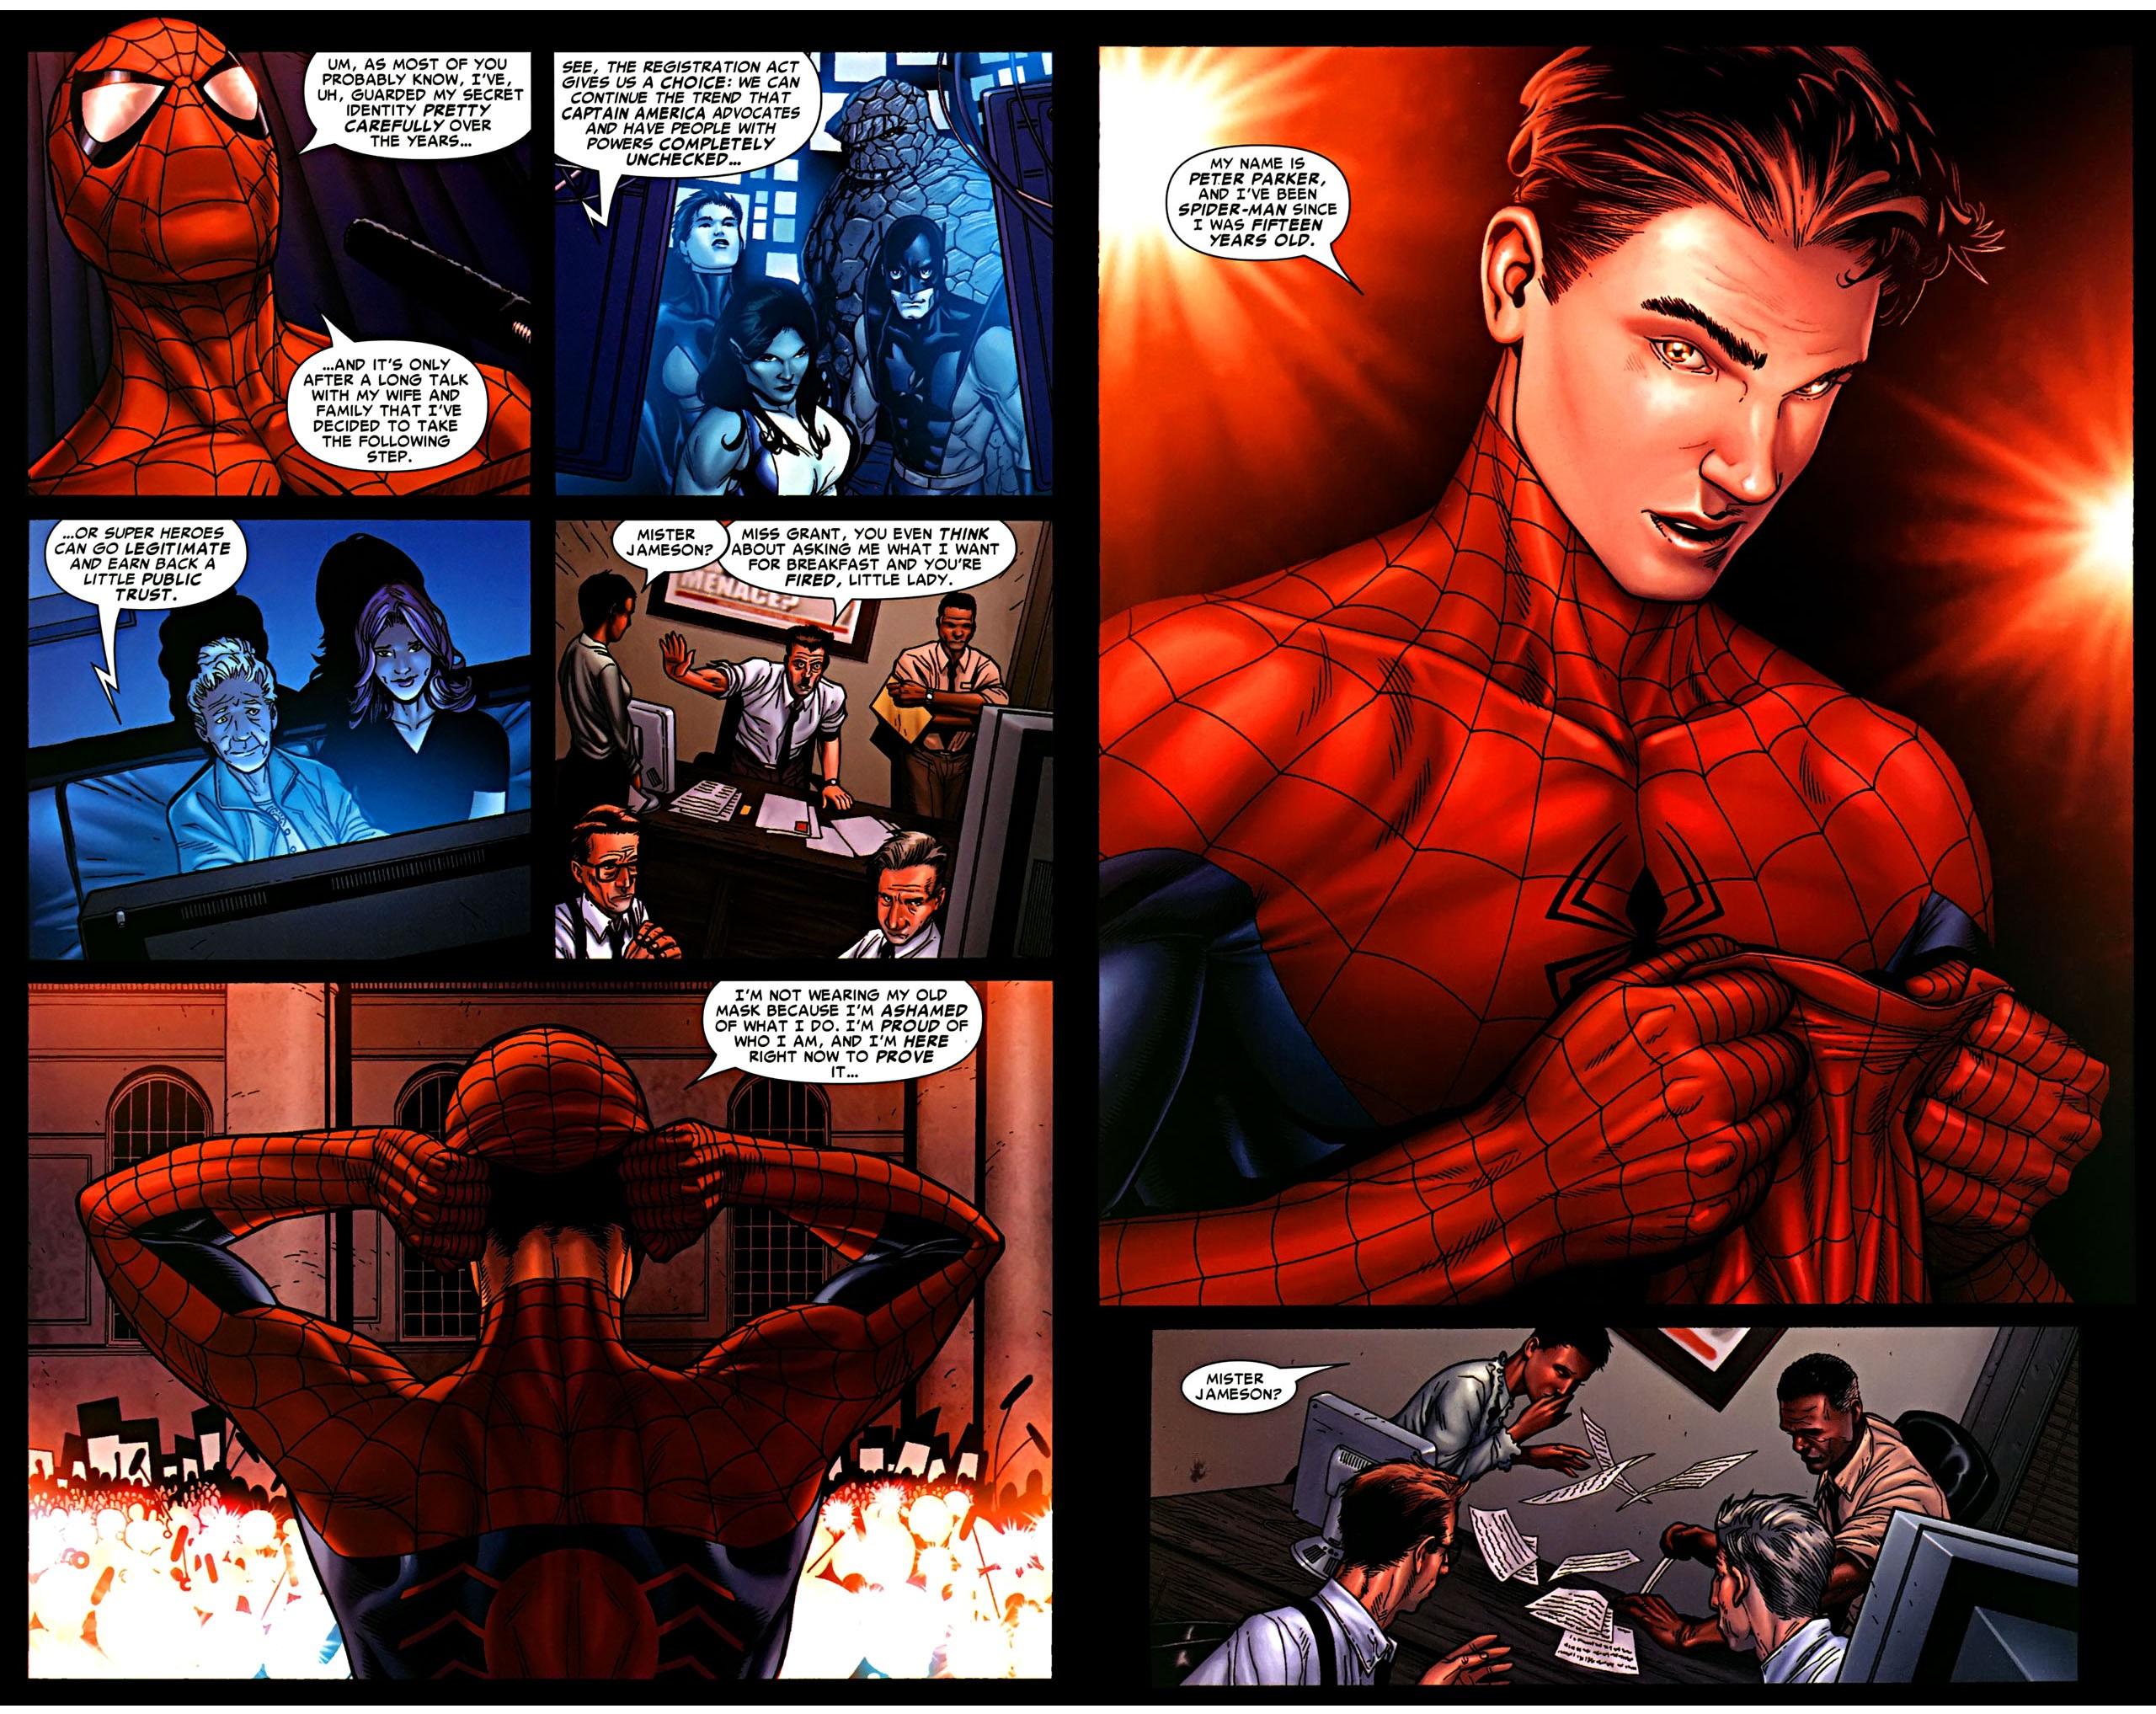 http://jakemailhot.files.wordpress.com/2014/01/spider-man-out.jpg